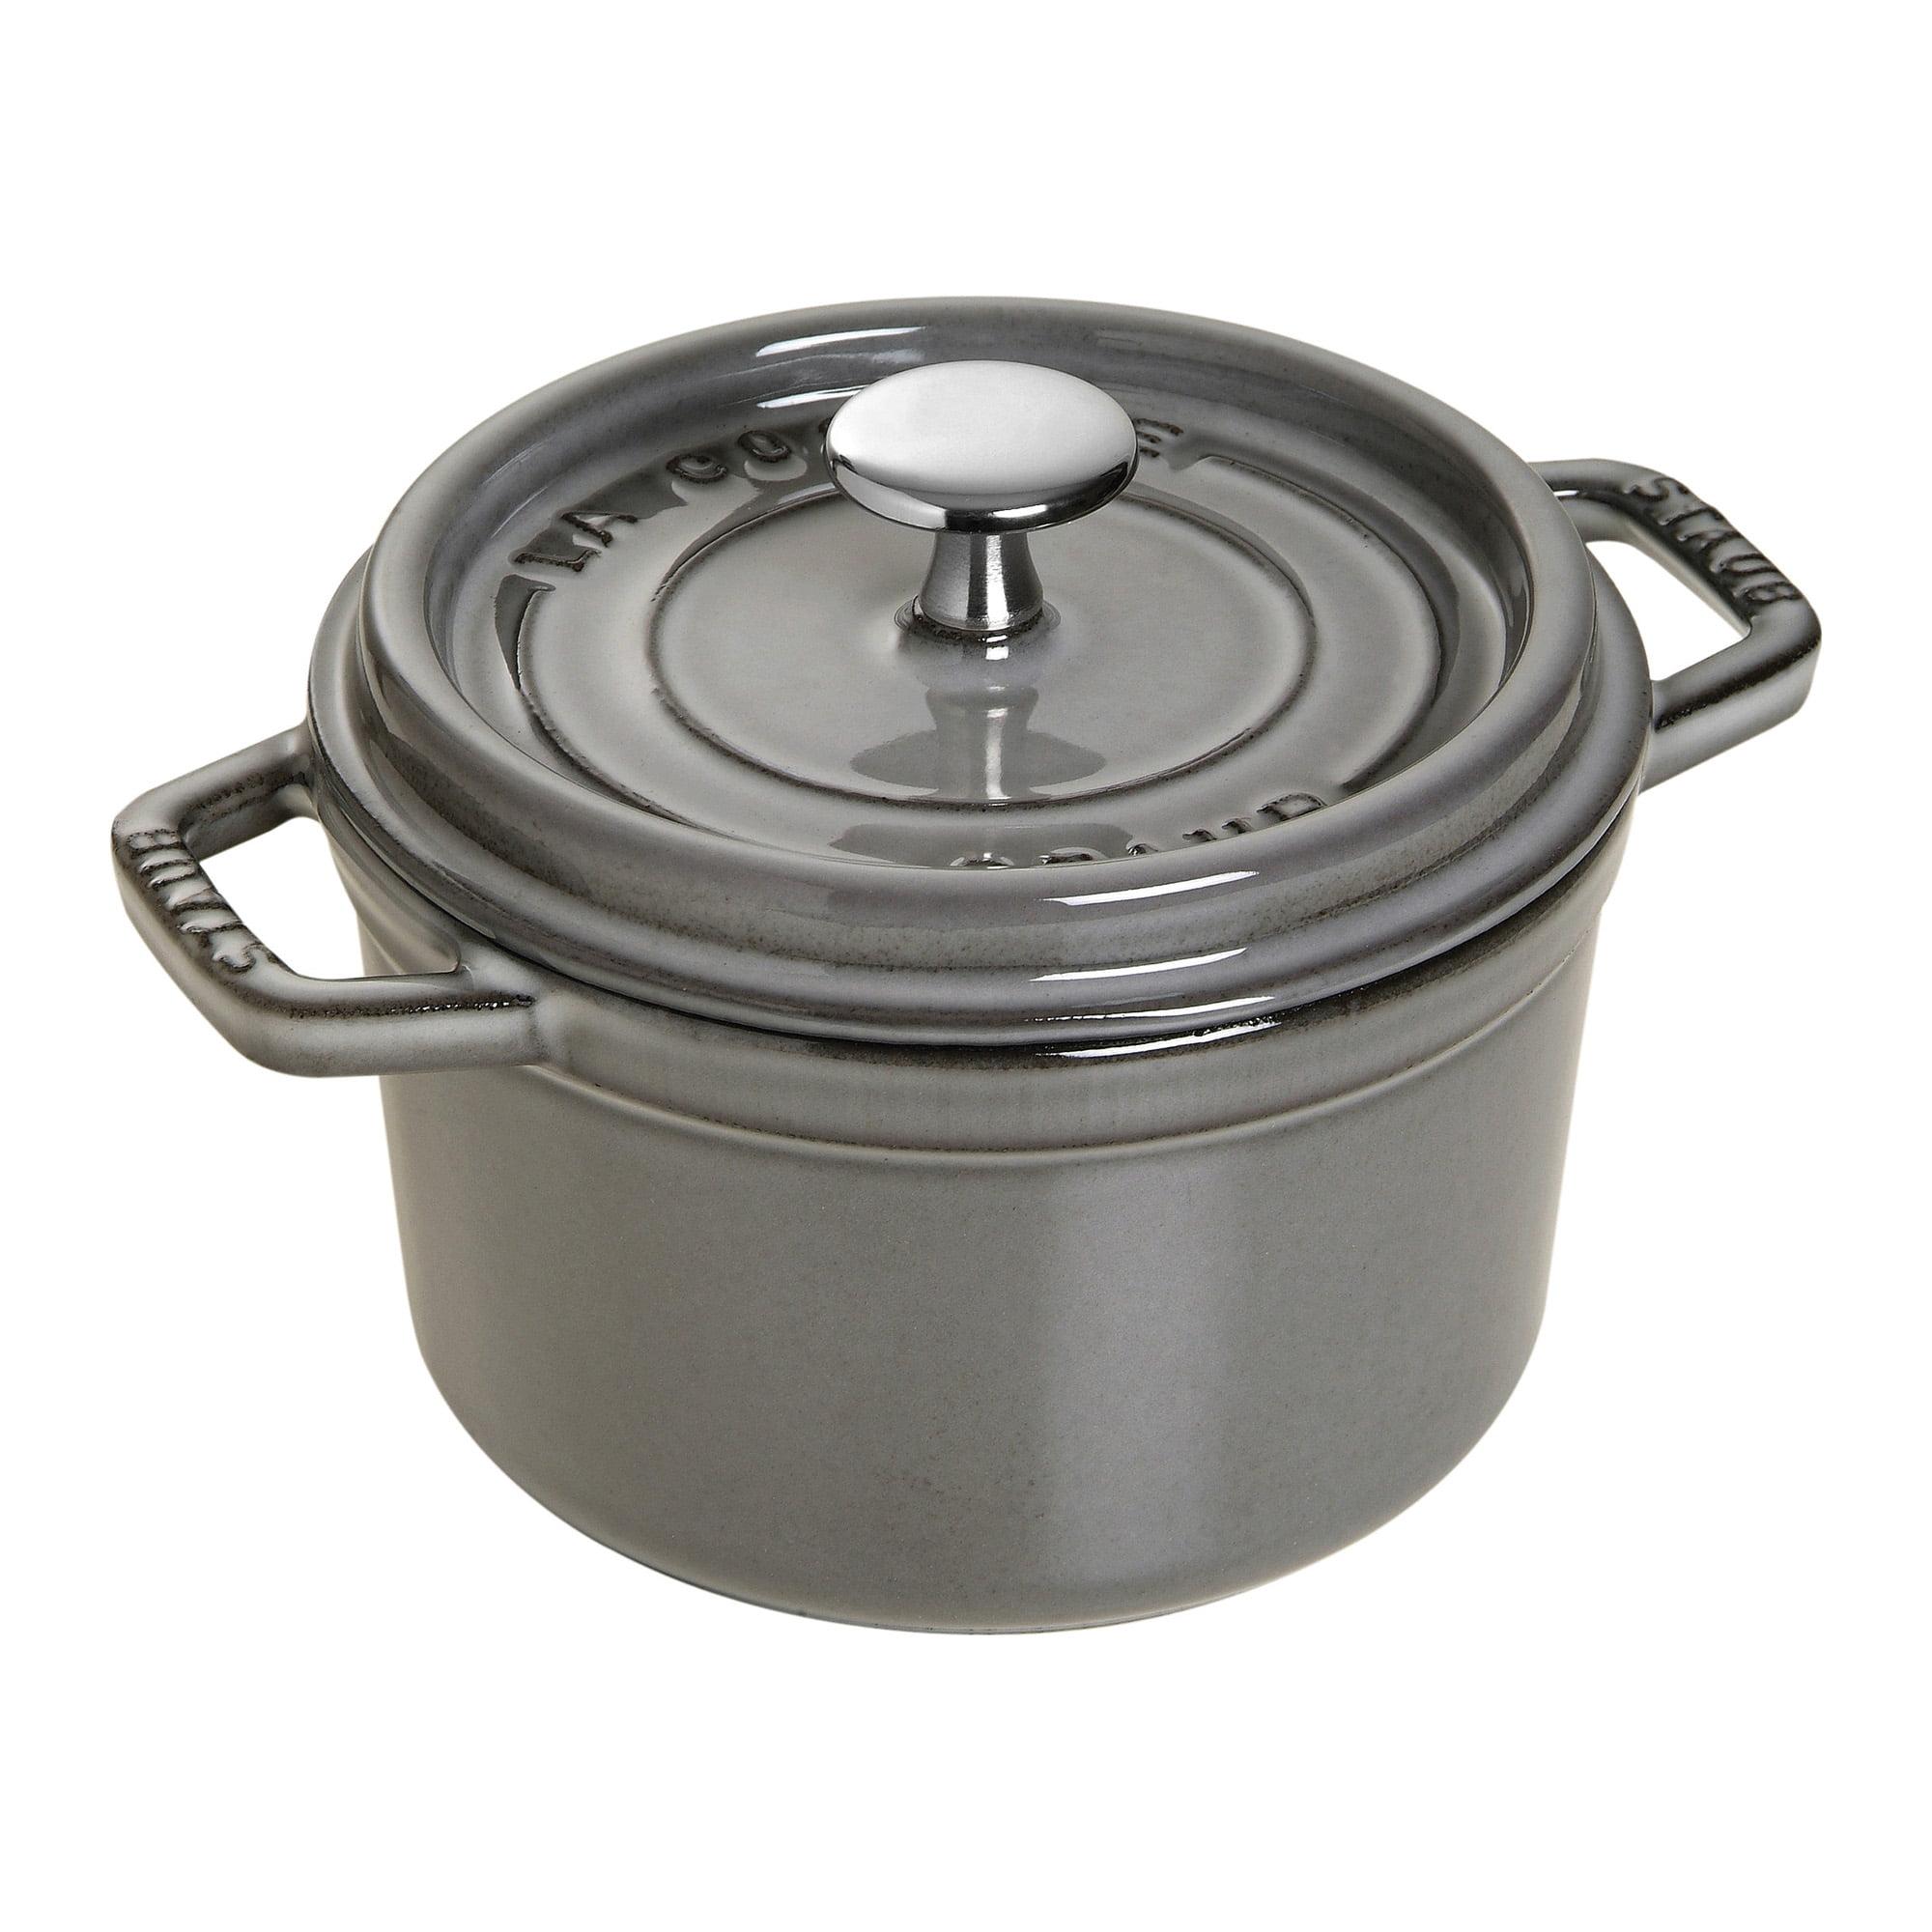 Staub Cast Iron 0.75-qt Round Cocotte - Graphite Grey